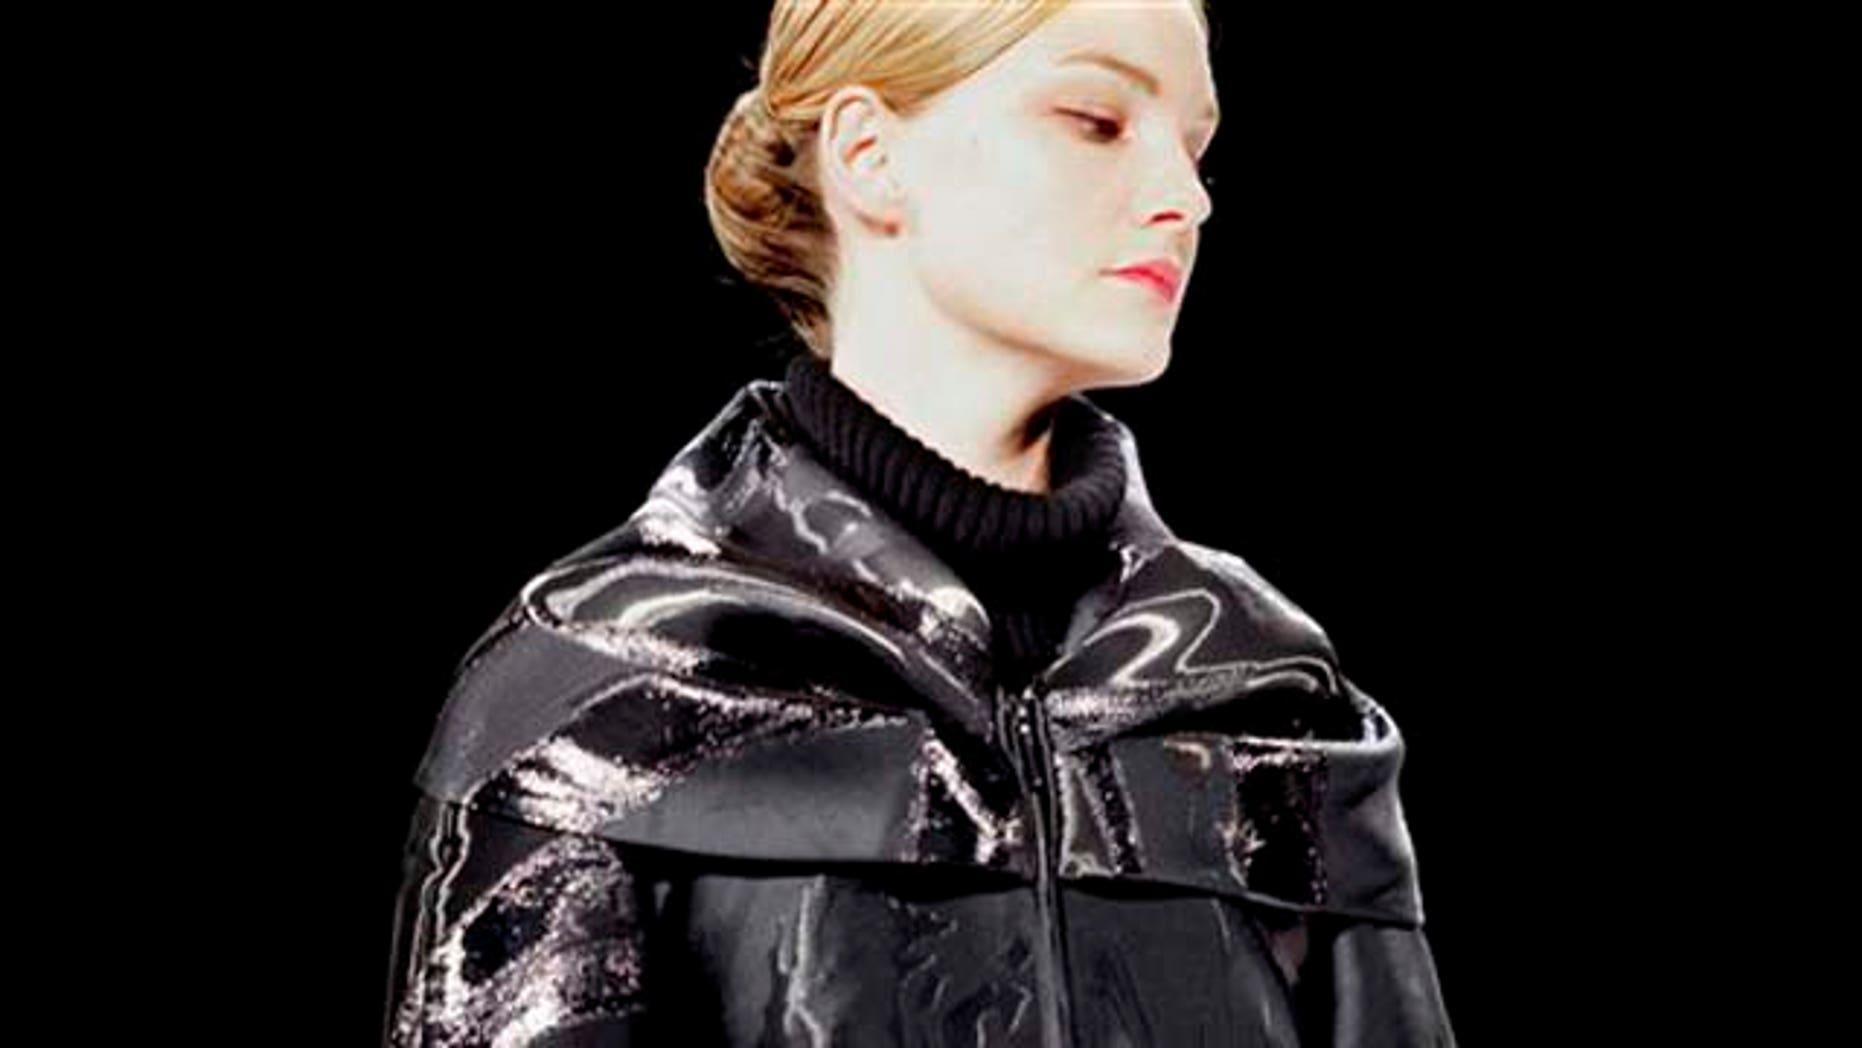 Fashion from the Fall 2011 collection of Carolina Herrera is modeled on Monday, Feb. 14, 2011 in New York.  (AP Photo/Bebeto Matthews)